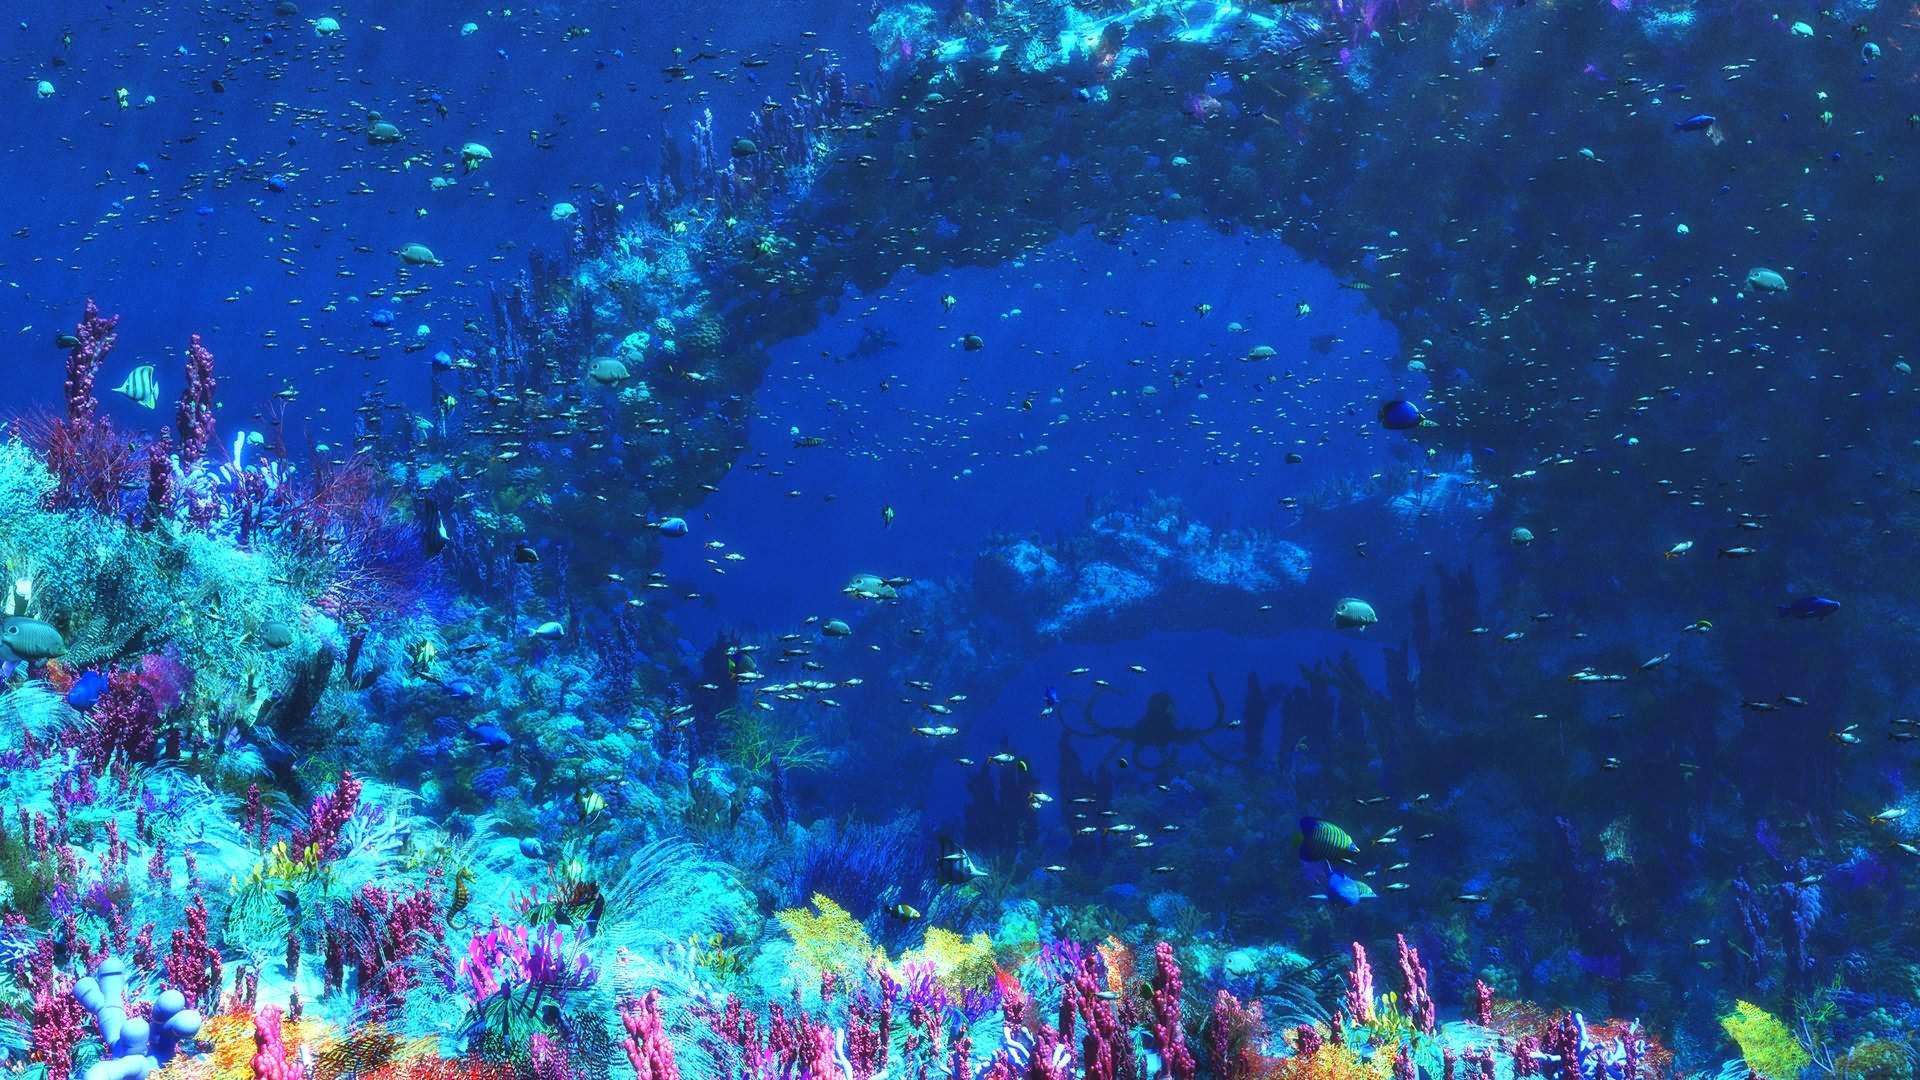 Animal   Sea Life Wallpaper 1920x1080